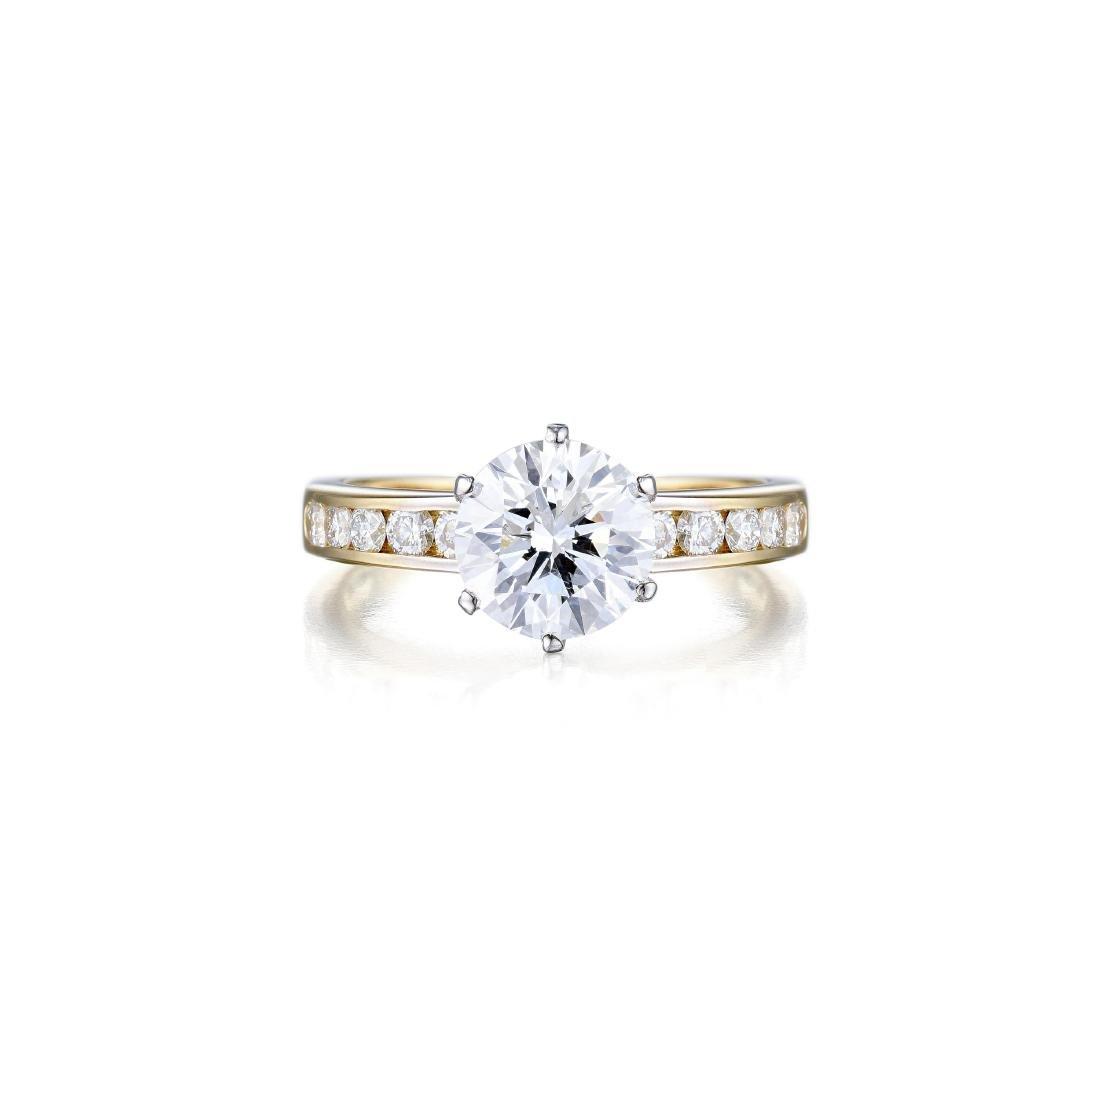 Tiffany & Co. 1.81-Carat Diamond Ring